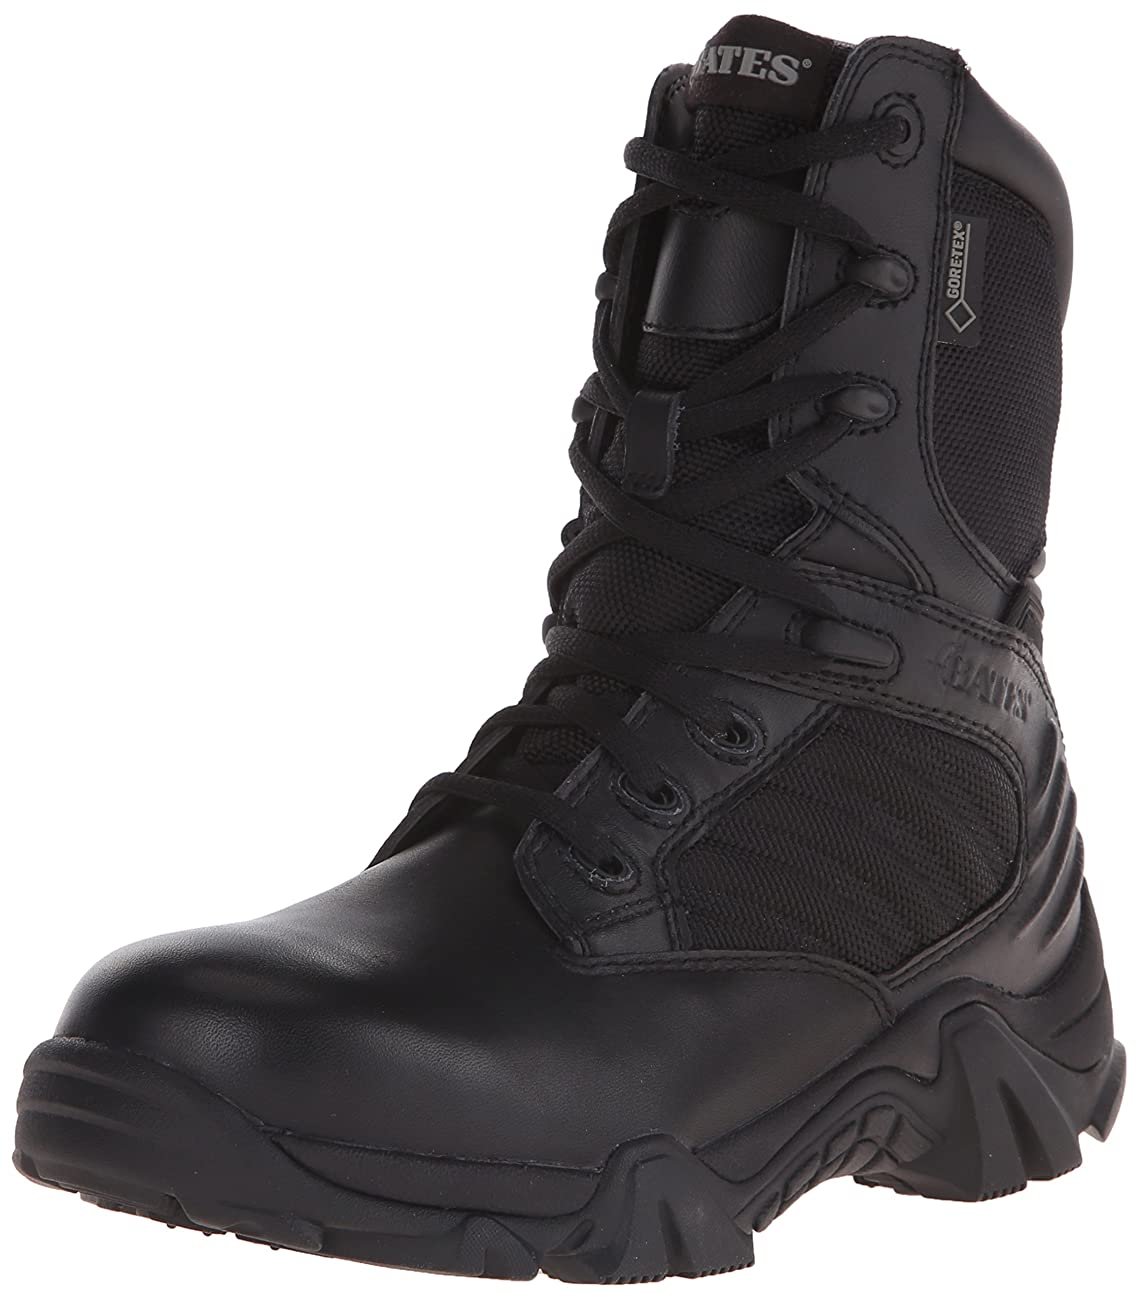 Bates Women's GX-8 8 Inch Boot